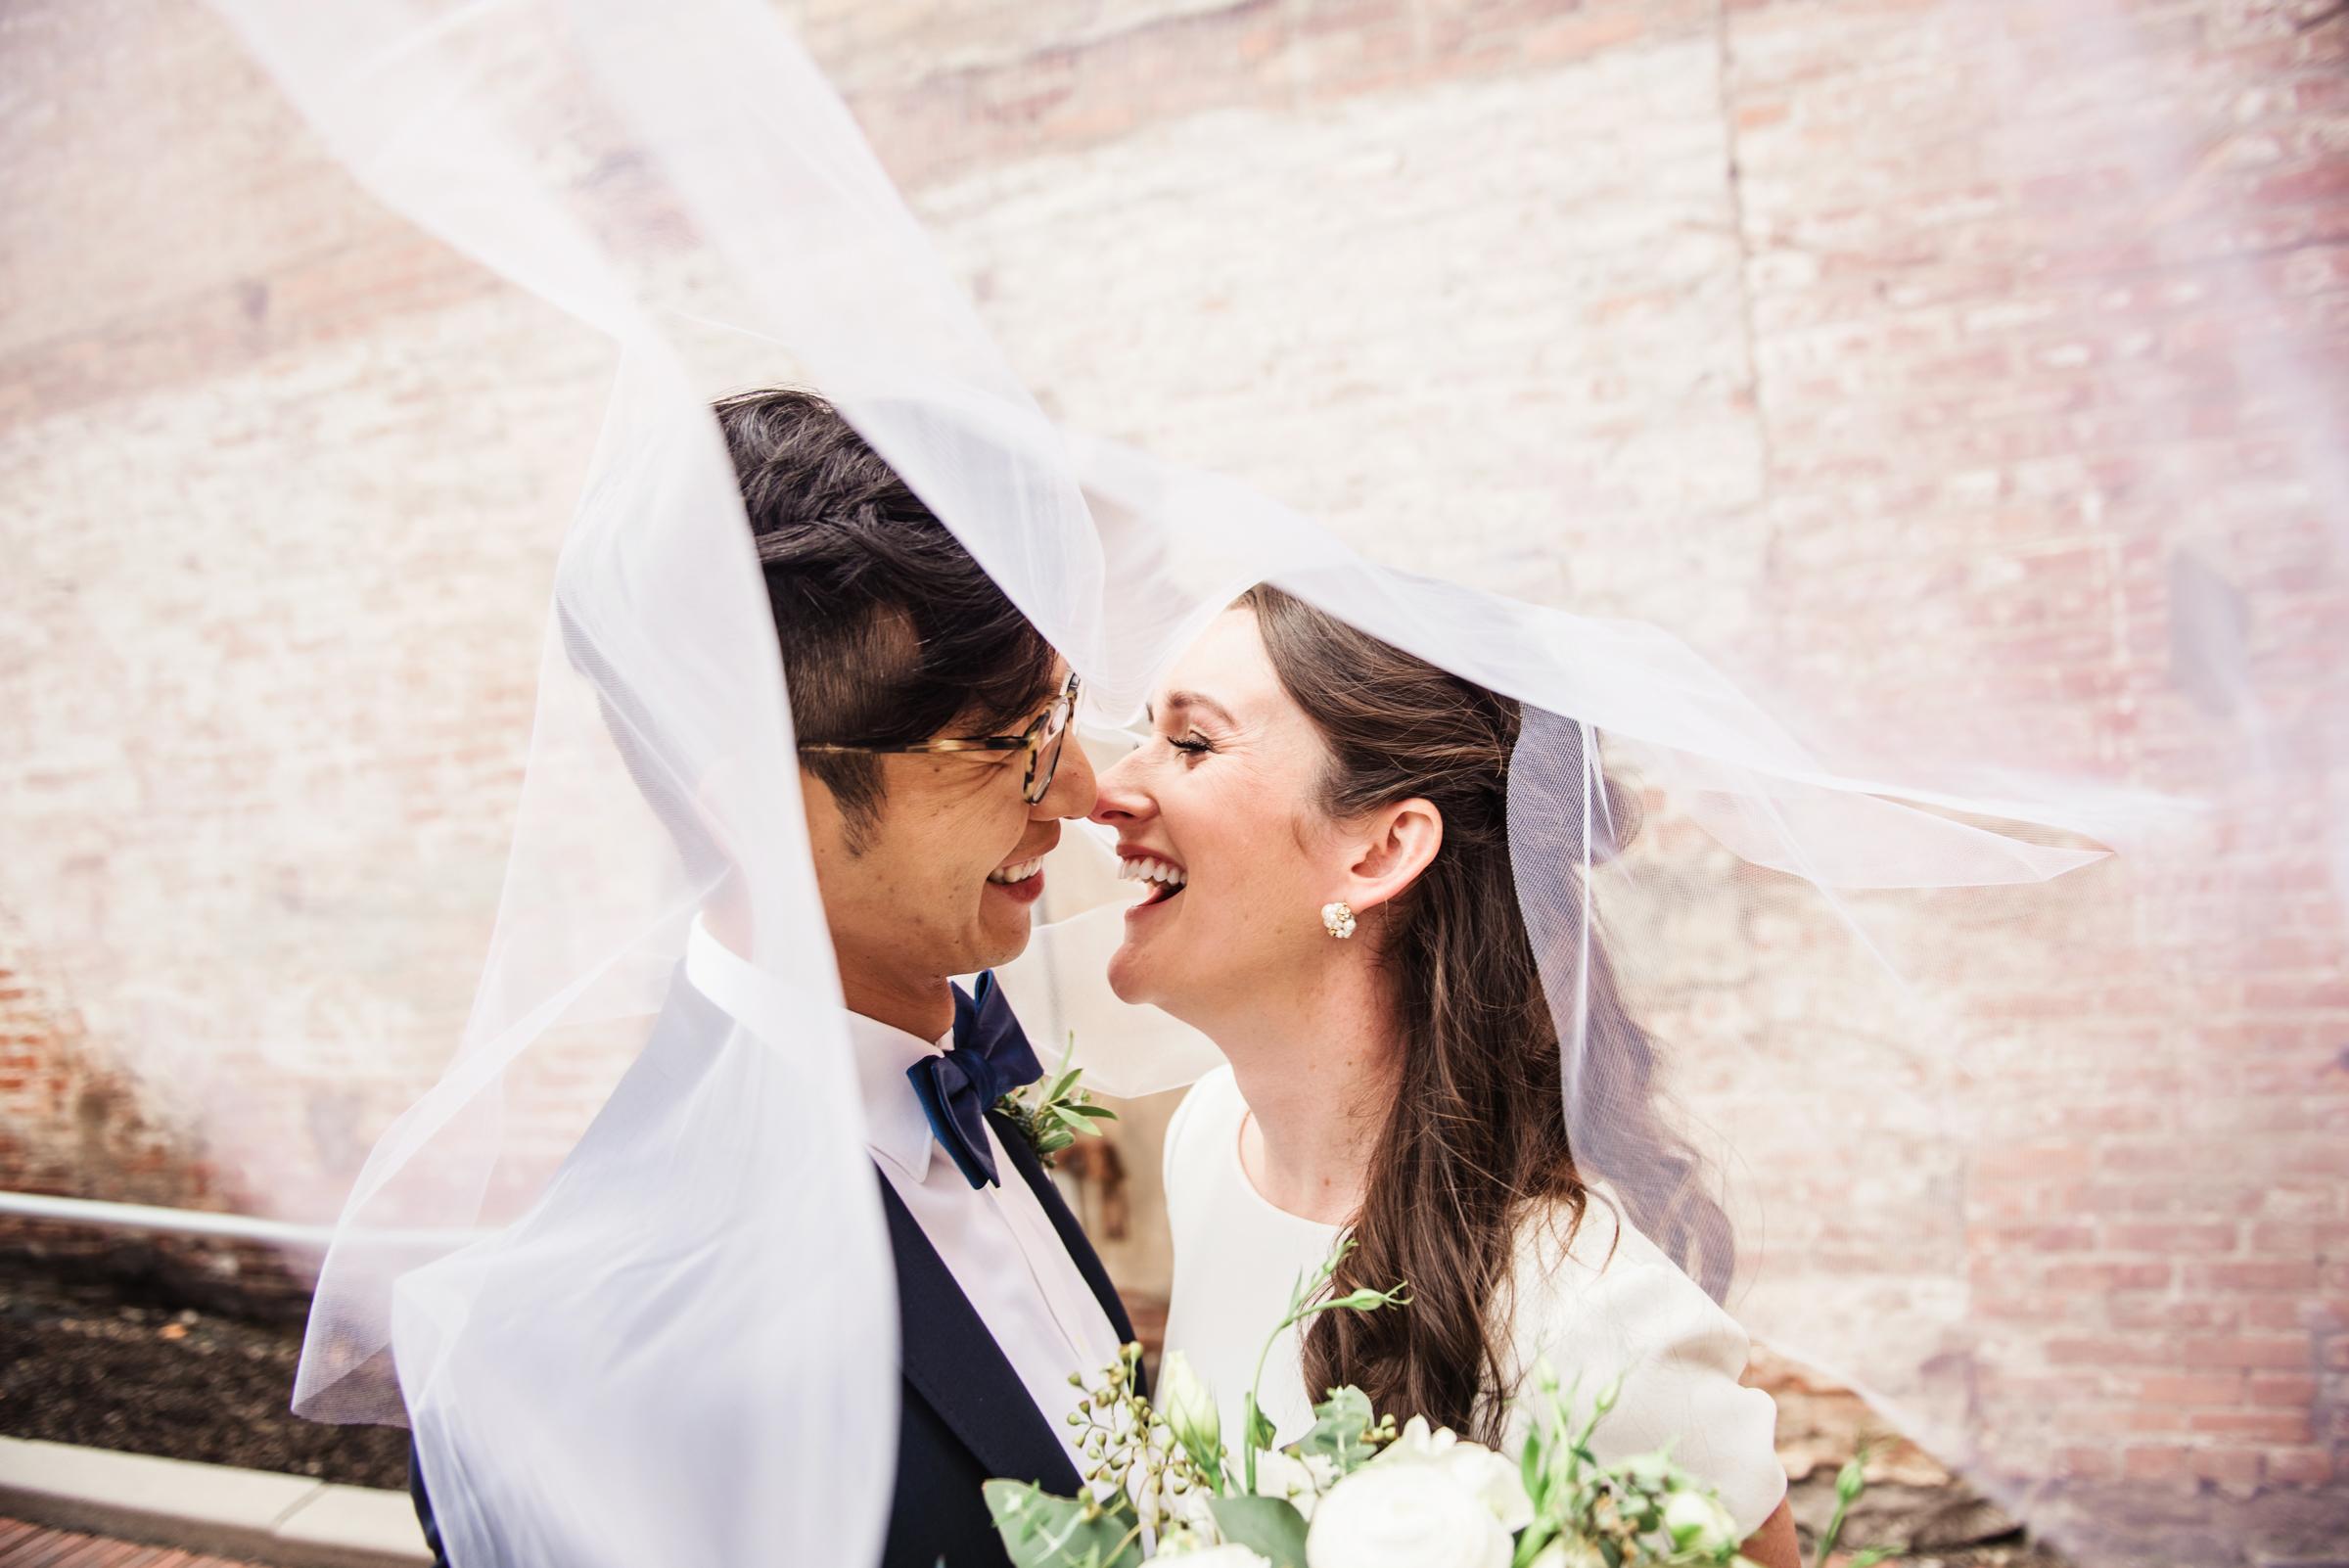 SKY_Armory_Syracuse_Wedding_JILL_STUDIO_Rochester_NY_Photographer_DSC_5973.jpg